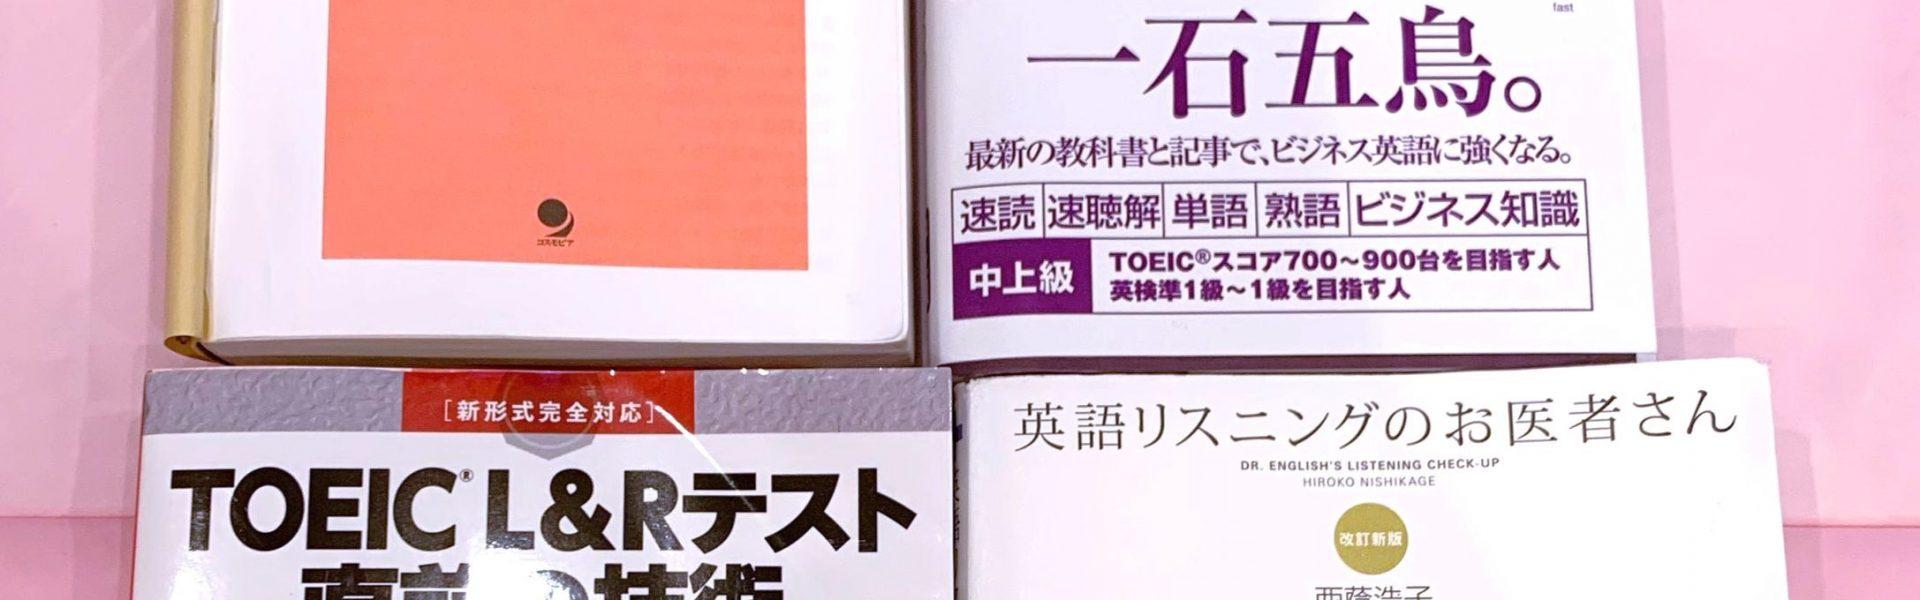 【TOEICスコアアップ・勉強法】3か月でTOEIC705点→760点&ビジネス英語力UPのために使用した英語本